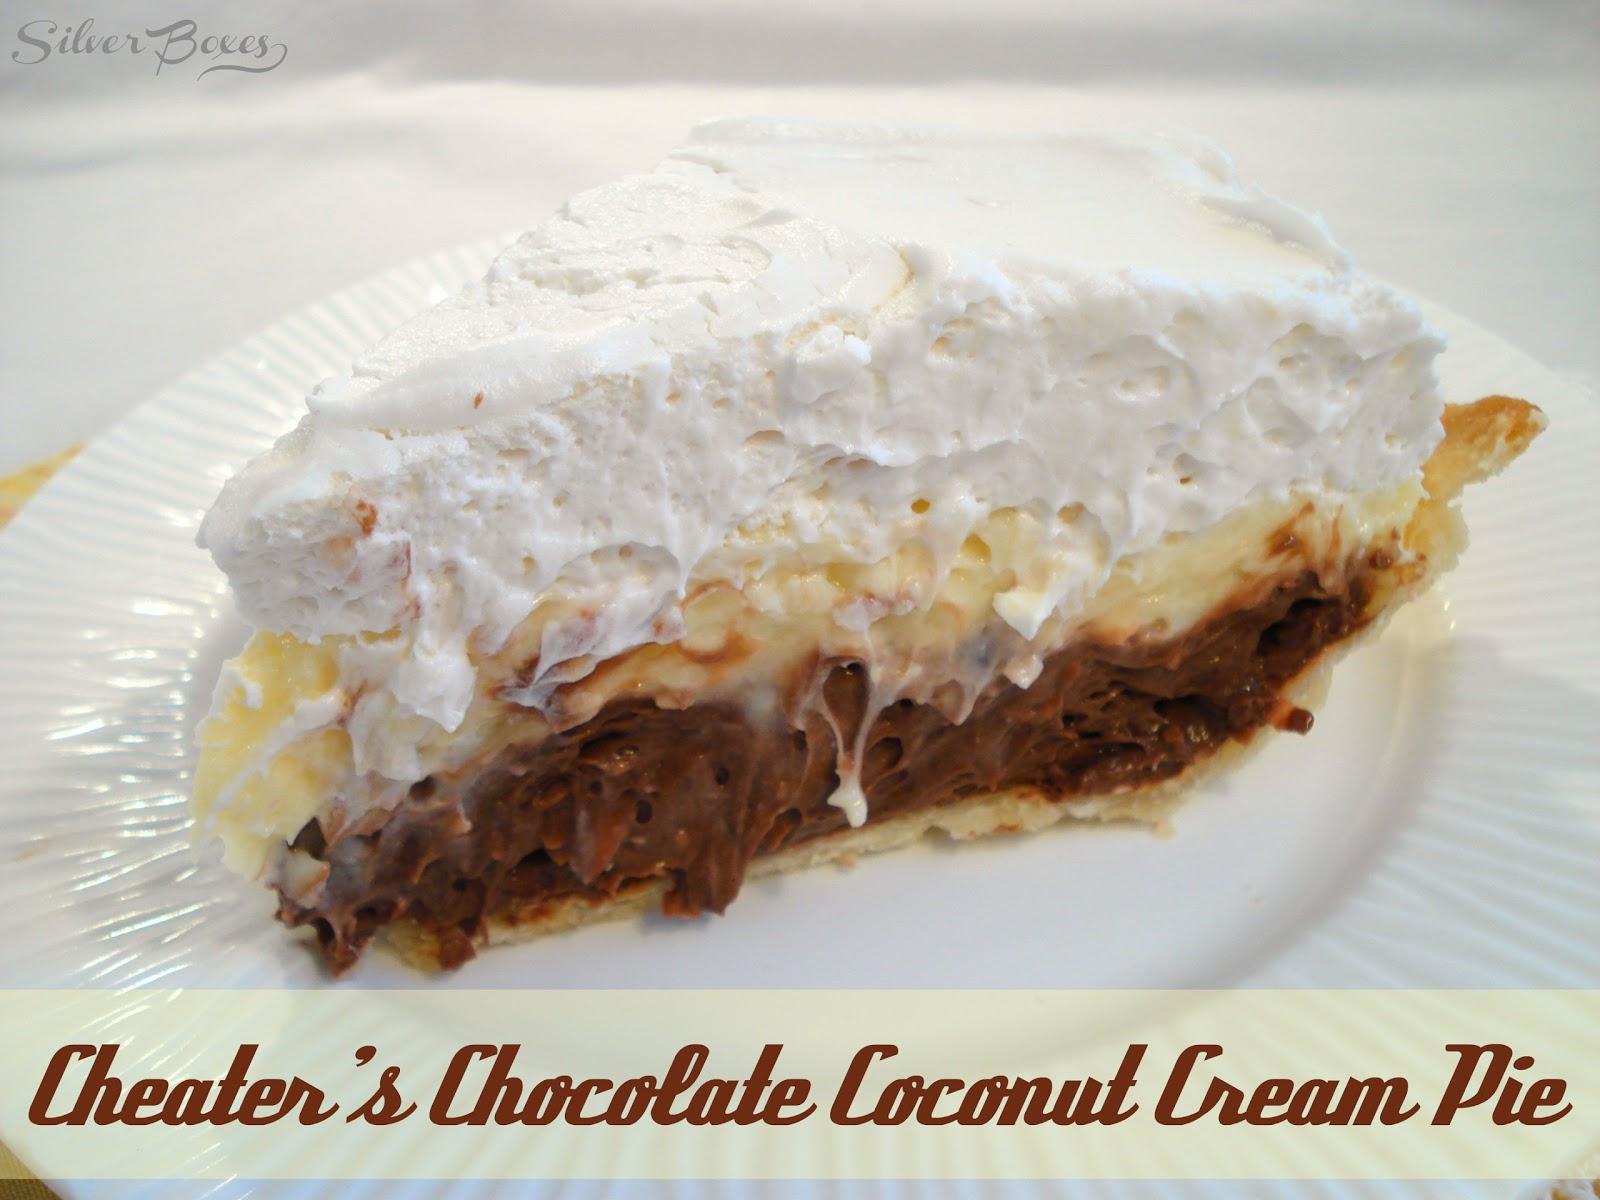 Silver Boxes: Cheater's Chocolate Coconut Cream Pie